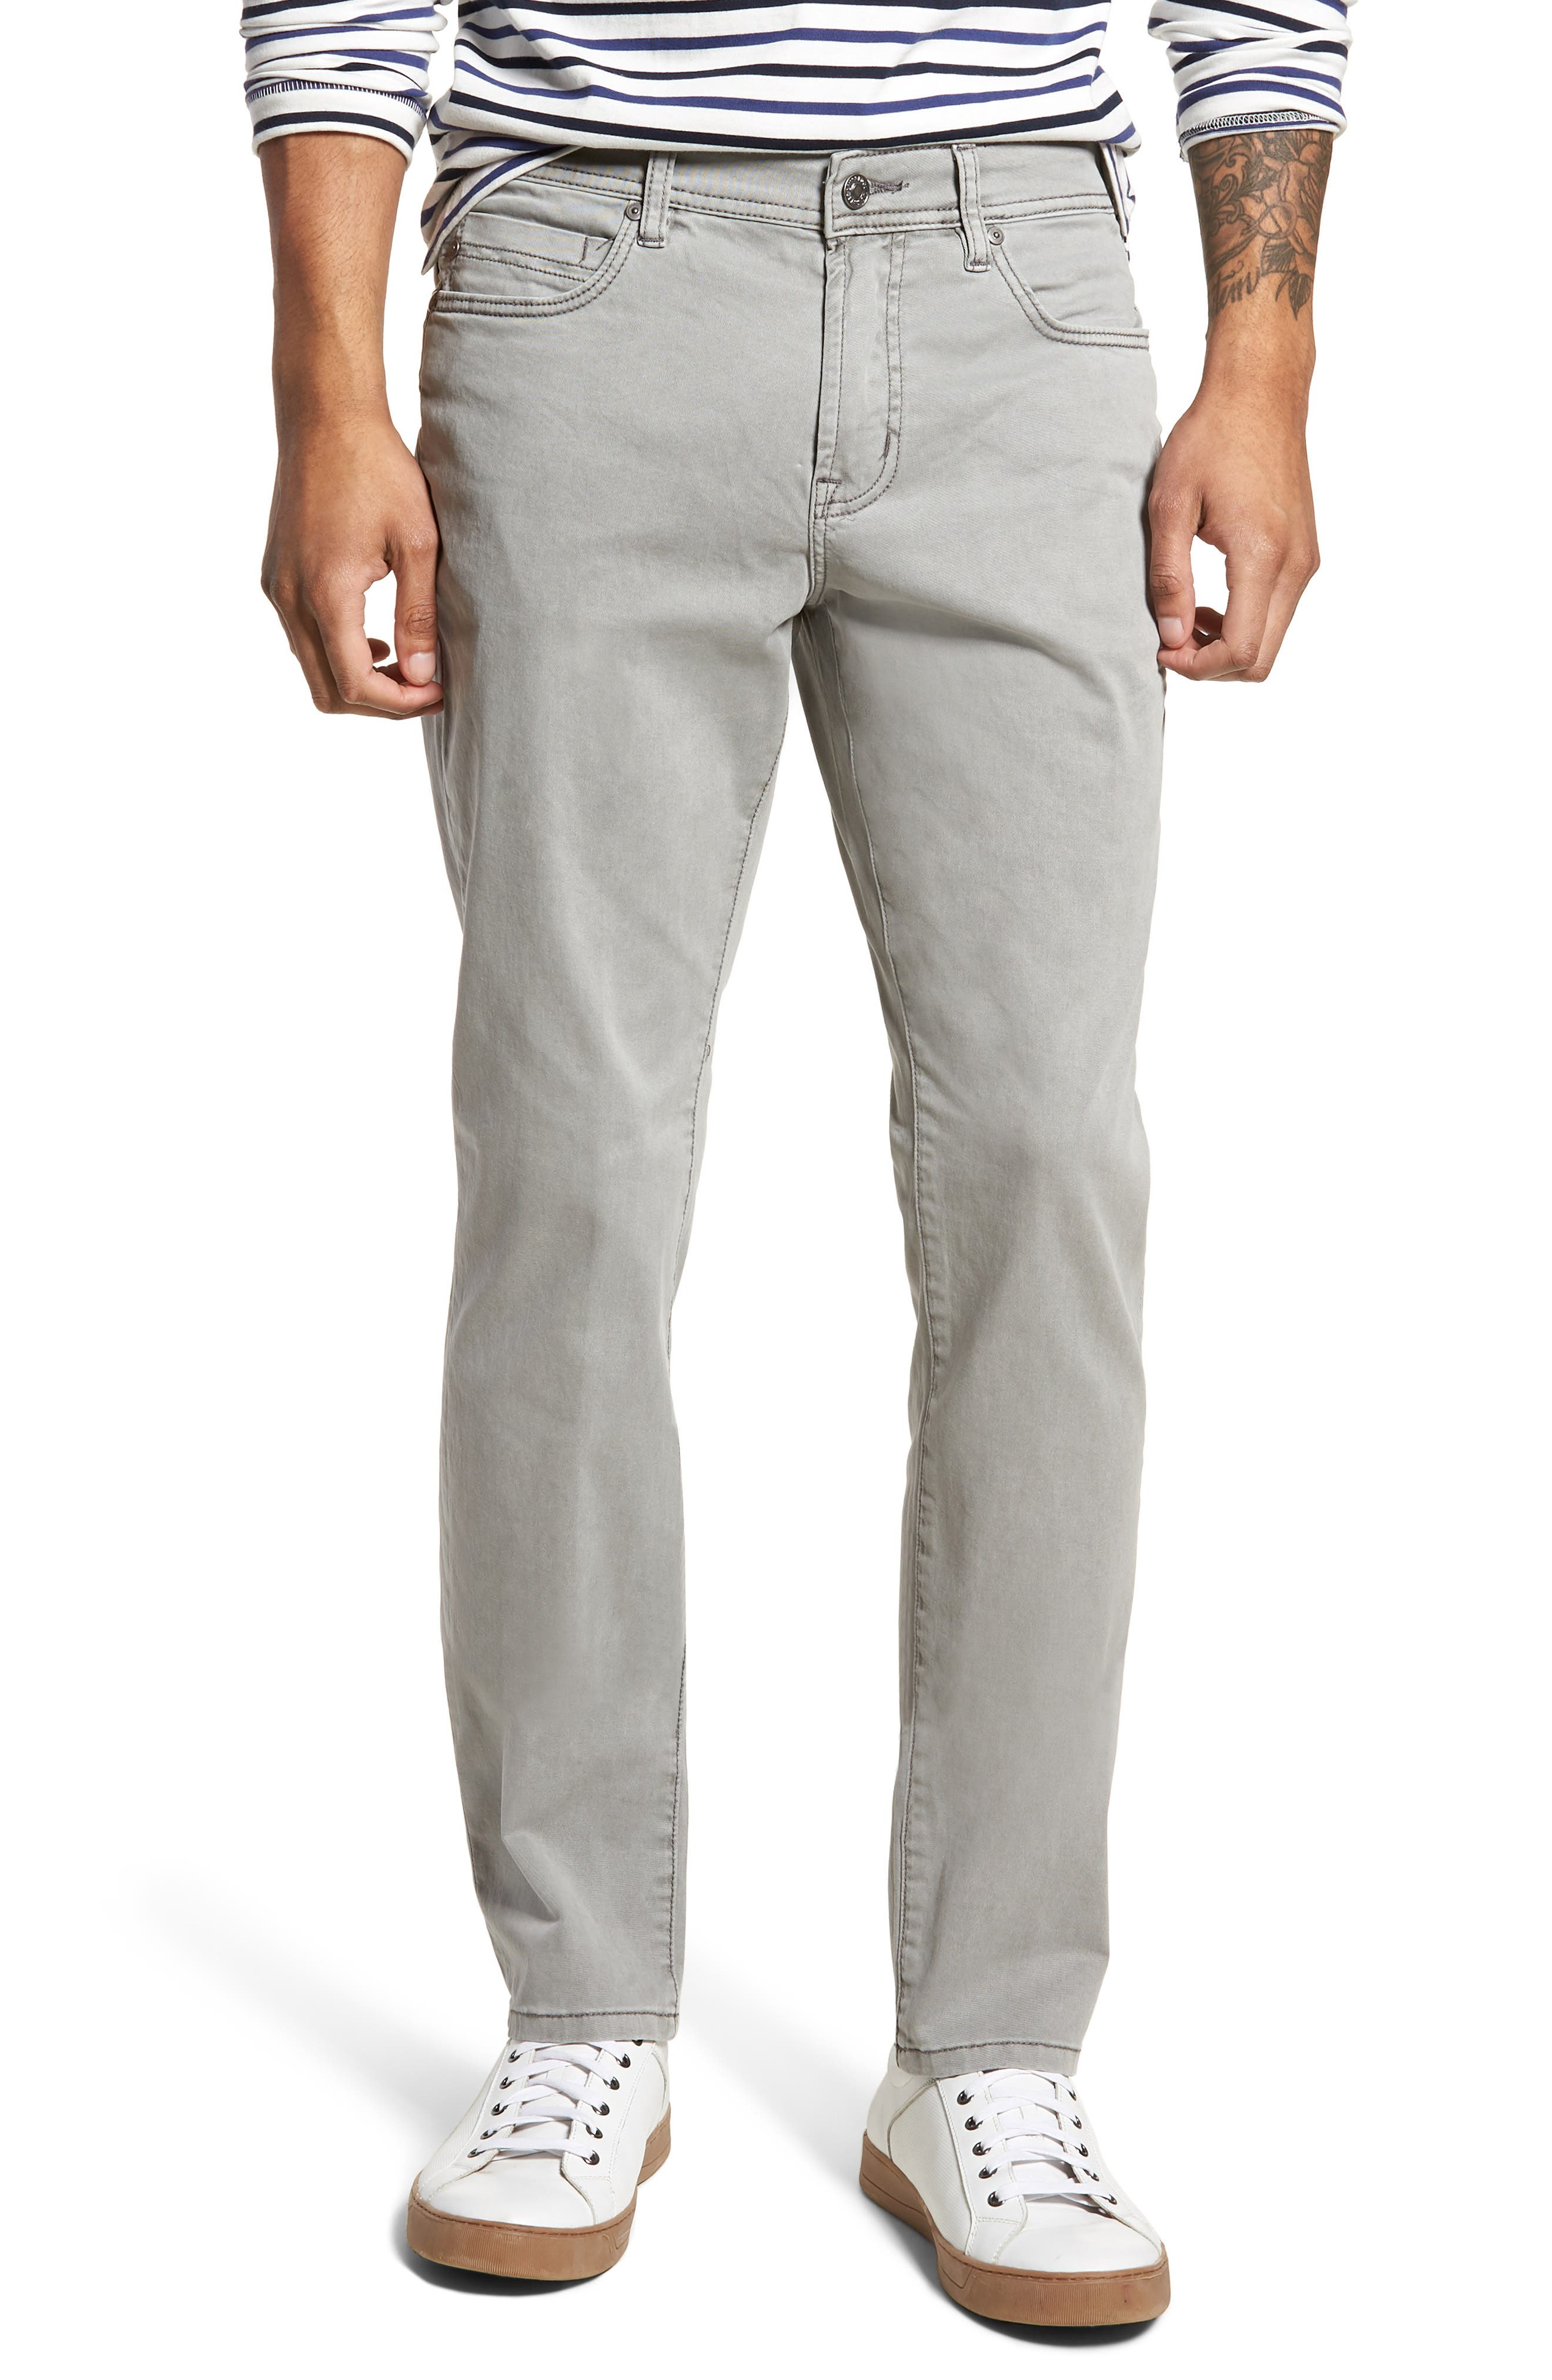 Jeans Co. Slim Straight Leg Jeans,                             Main thumbnail 1, color,                             SHARKSKIN